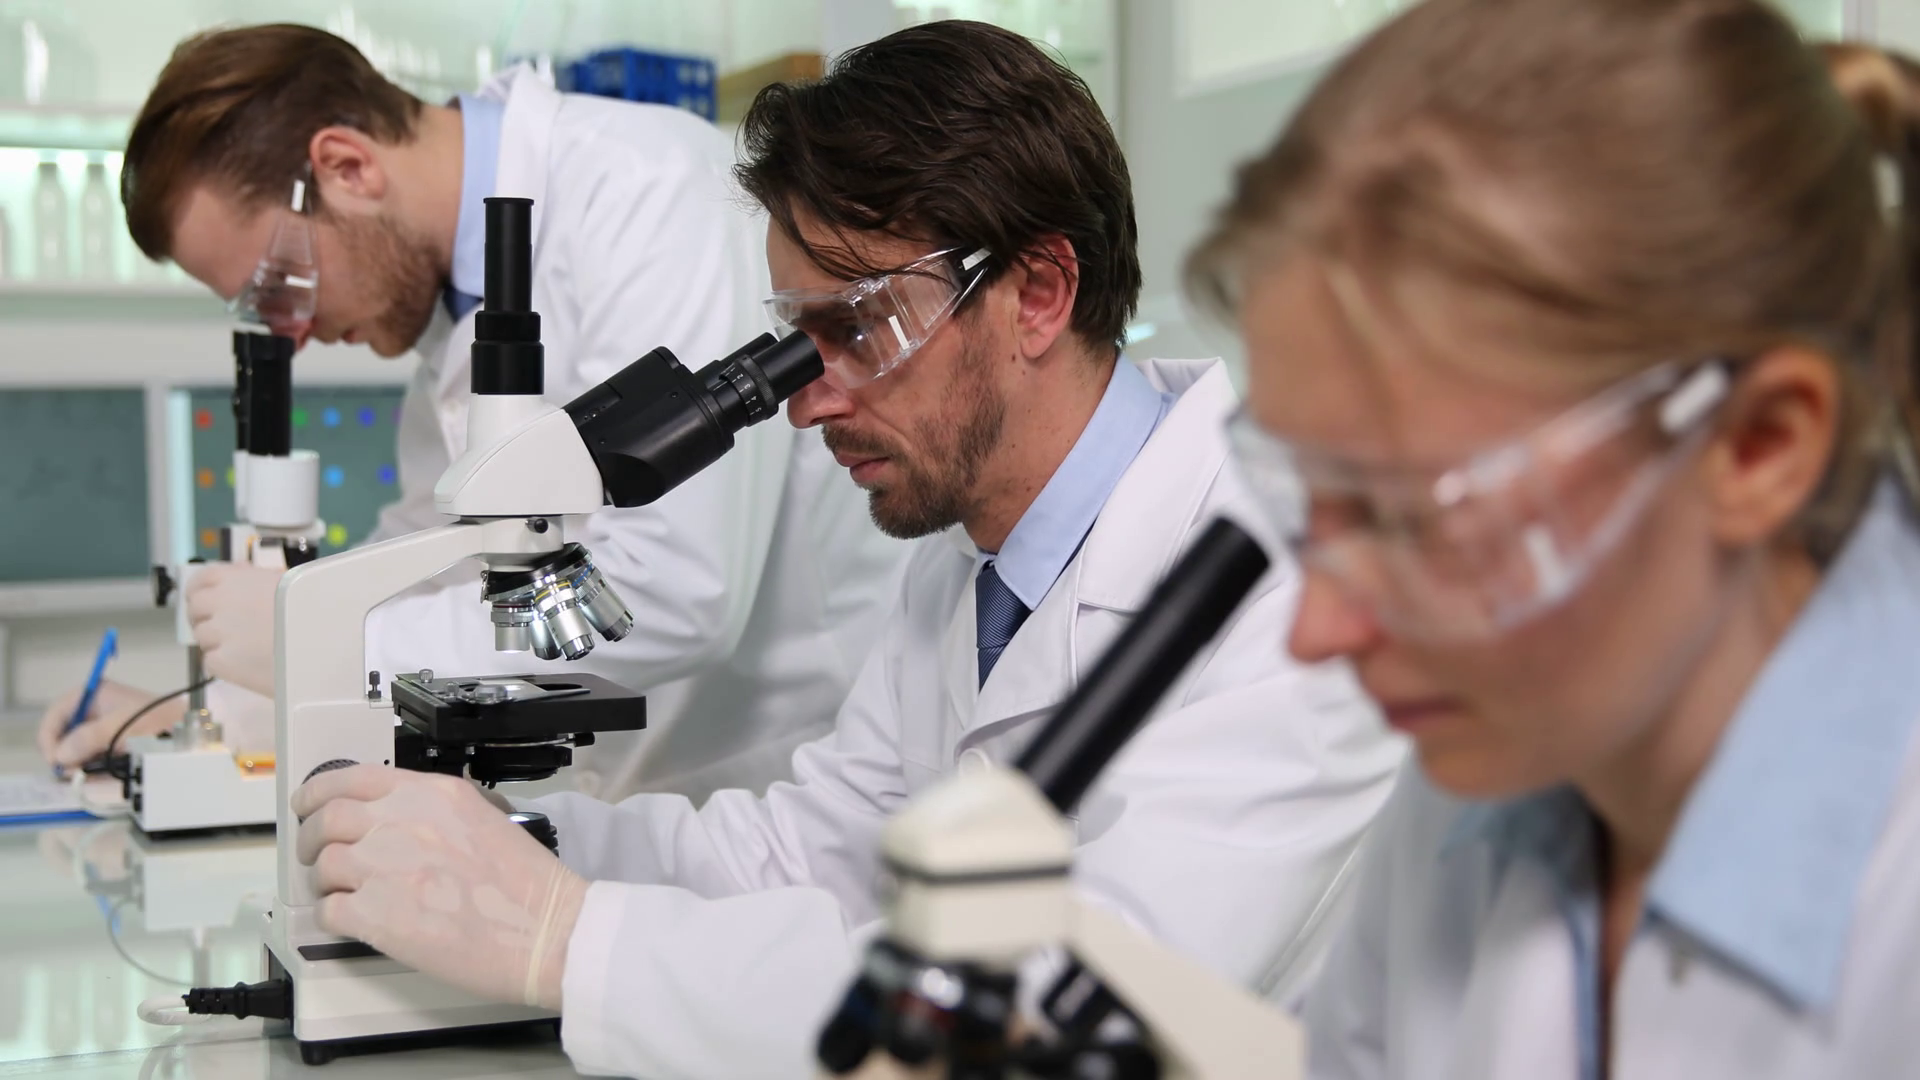 videoblocks-hospital-microbiology-laboratory-team-of-researchers-work-activity-on-microscope_r_x3-kkx2x_thumbnail-full01